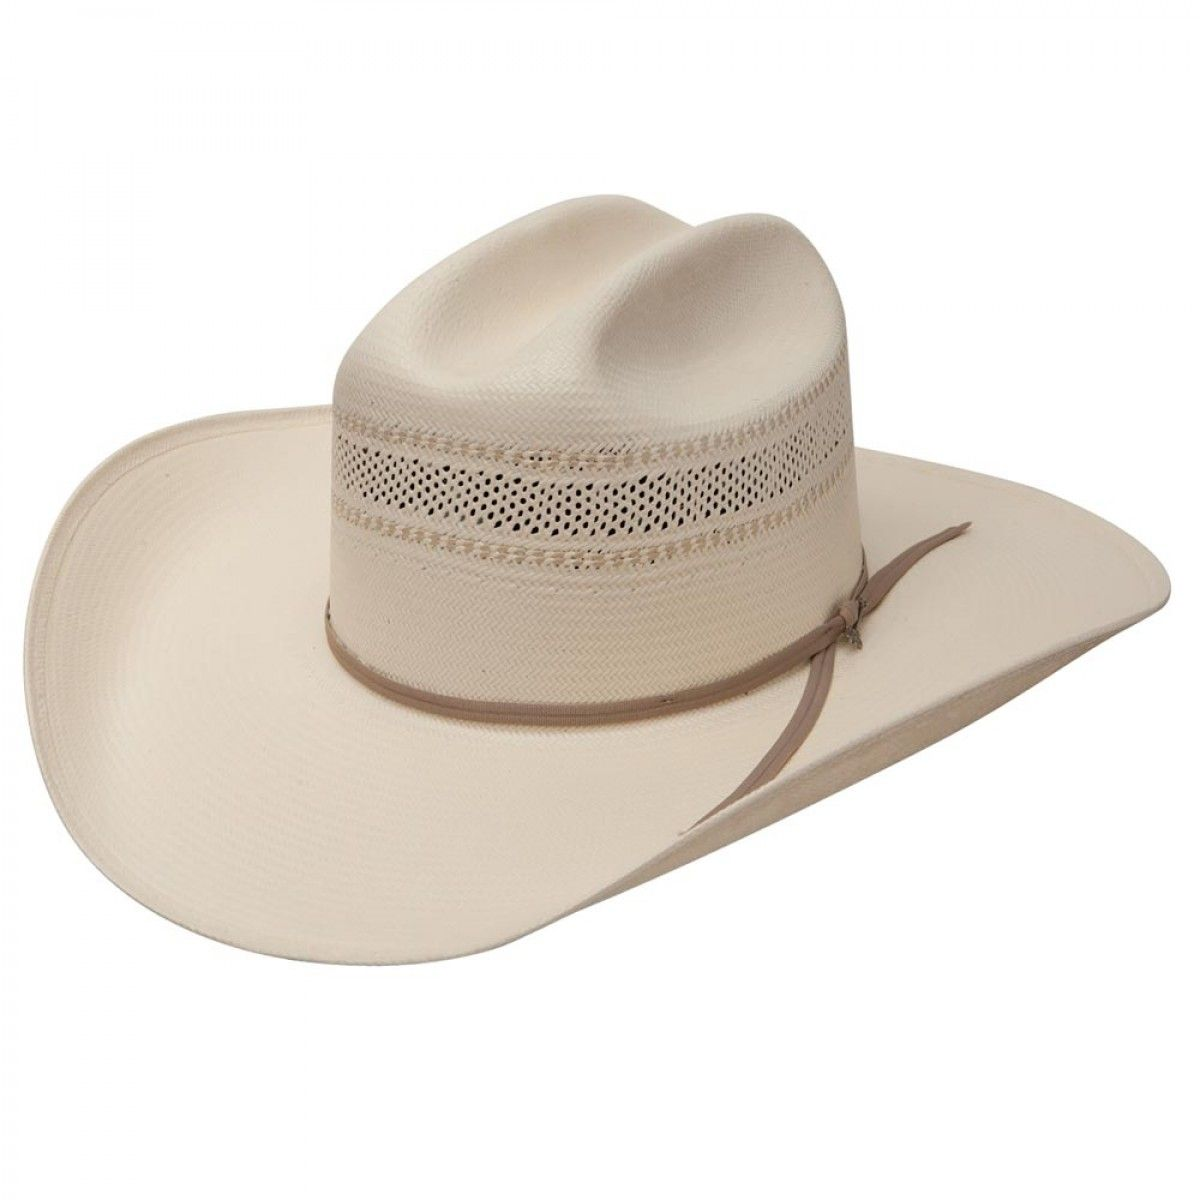 5b9c6c2a8d9 Stetson Dunham – (10X) Straw Cowboy Hat